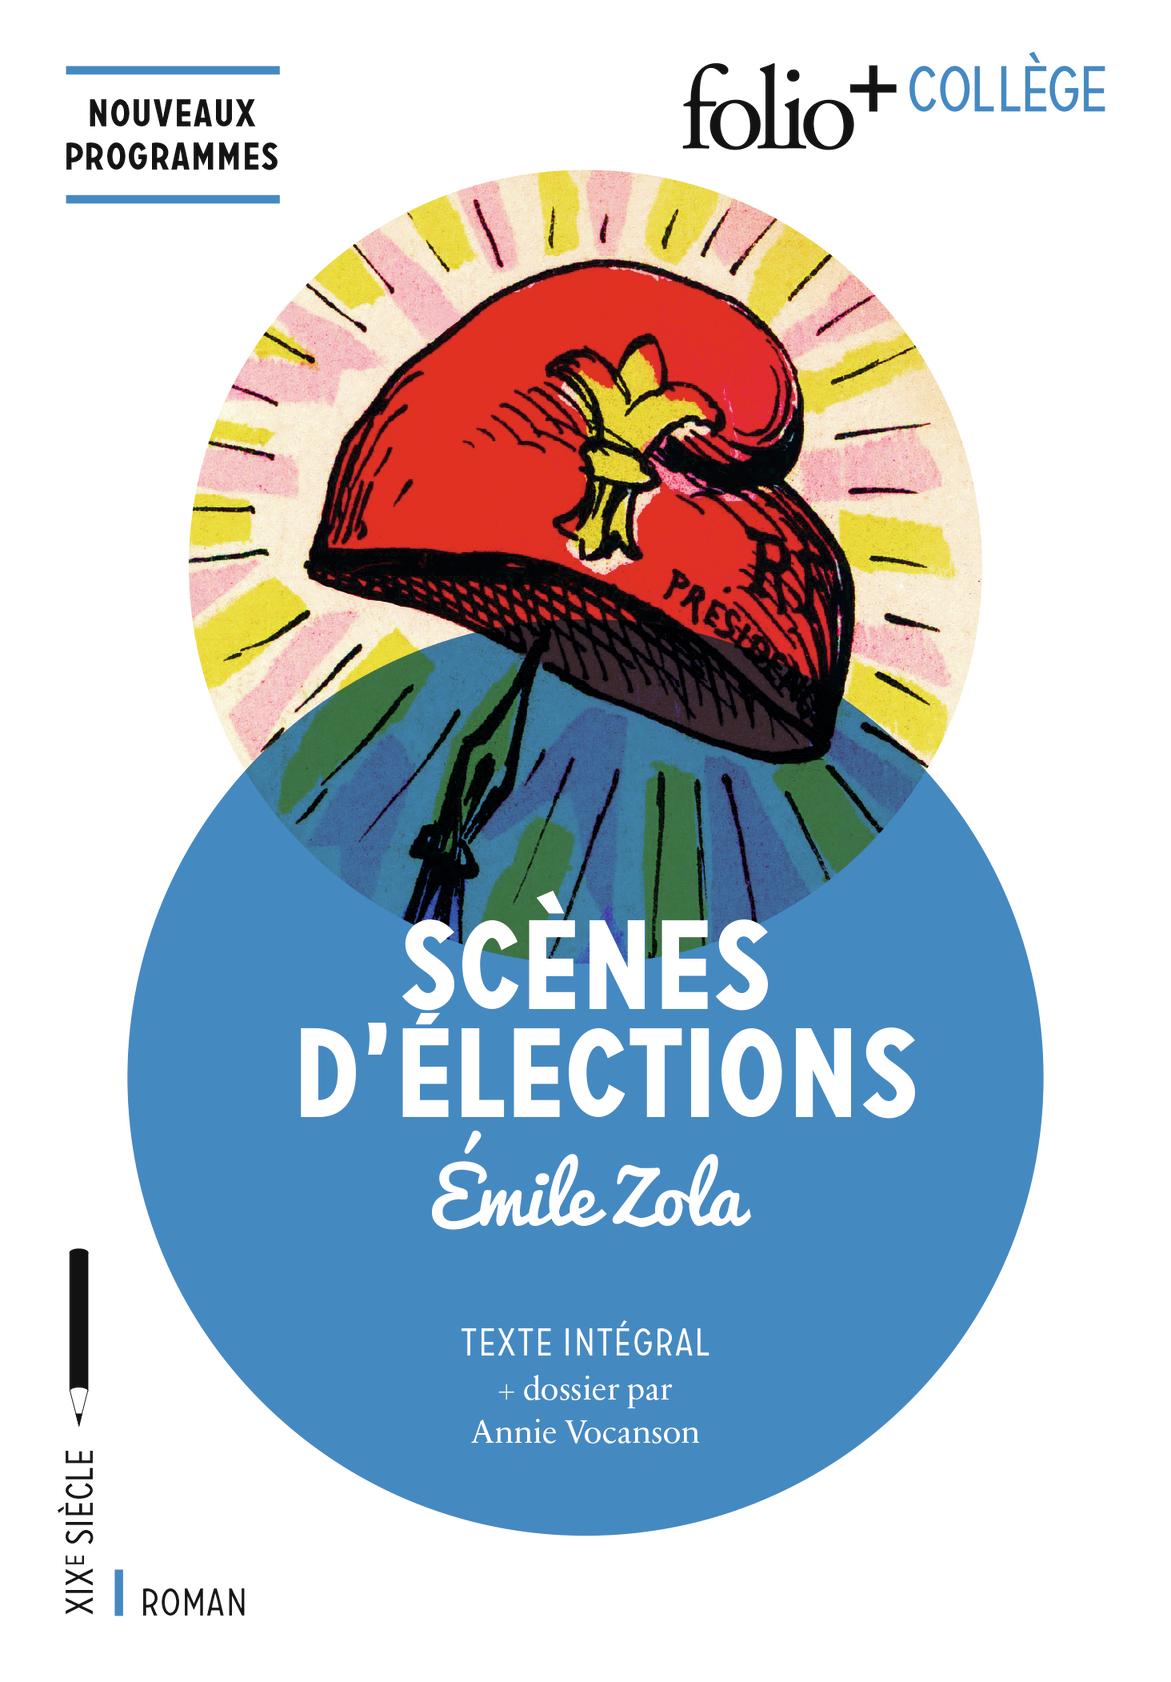 SCENES D'ELECTIONS